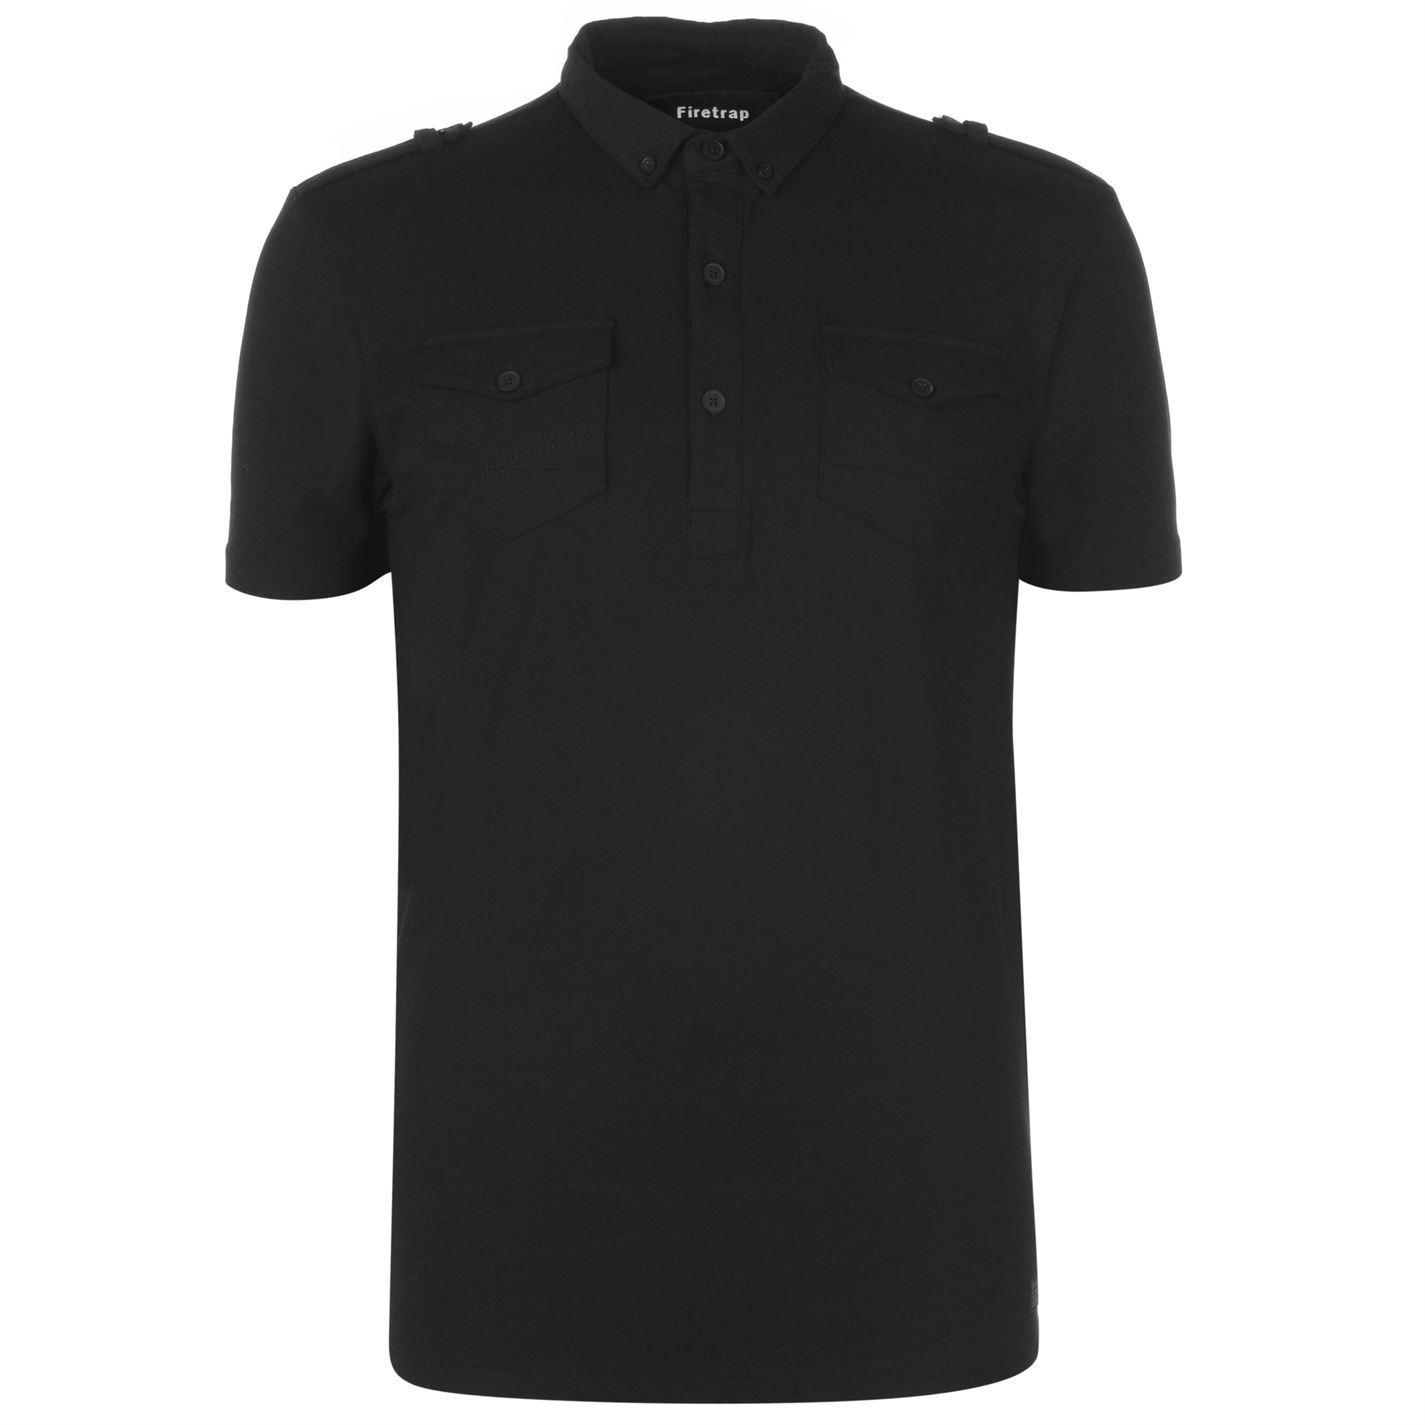 thumbnail 5 - Firetrap-Double-Pocket-Polo-Shirt-Mens-Collar-Top-Tee-Black-Medium